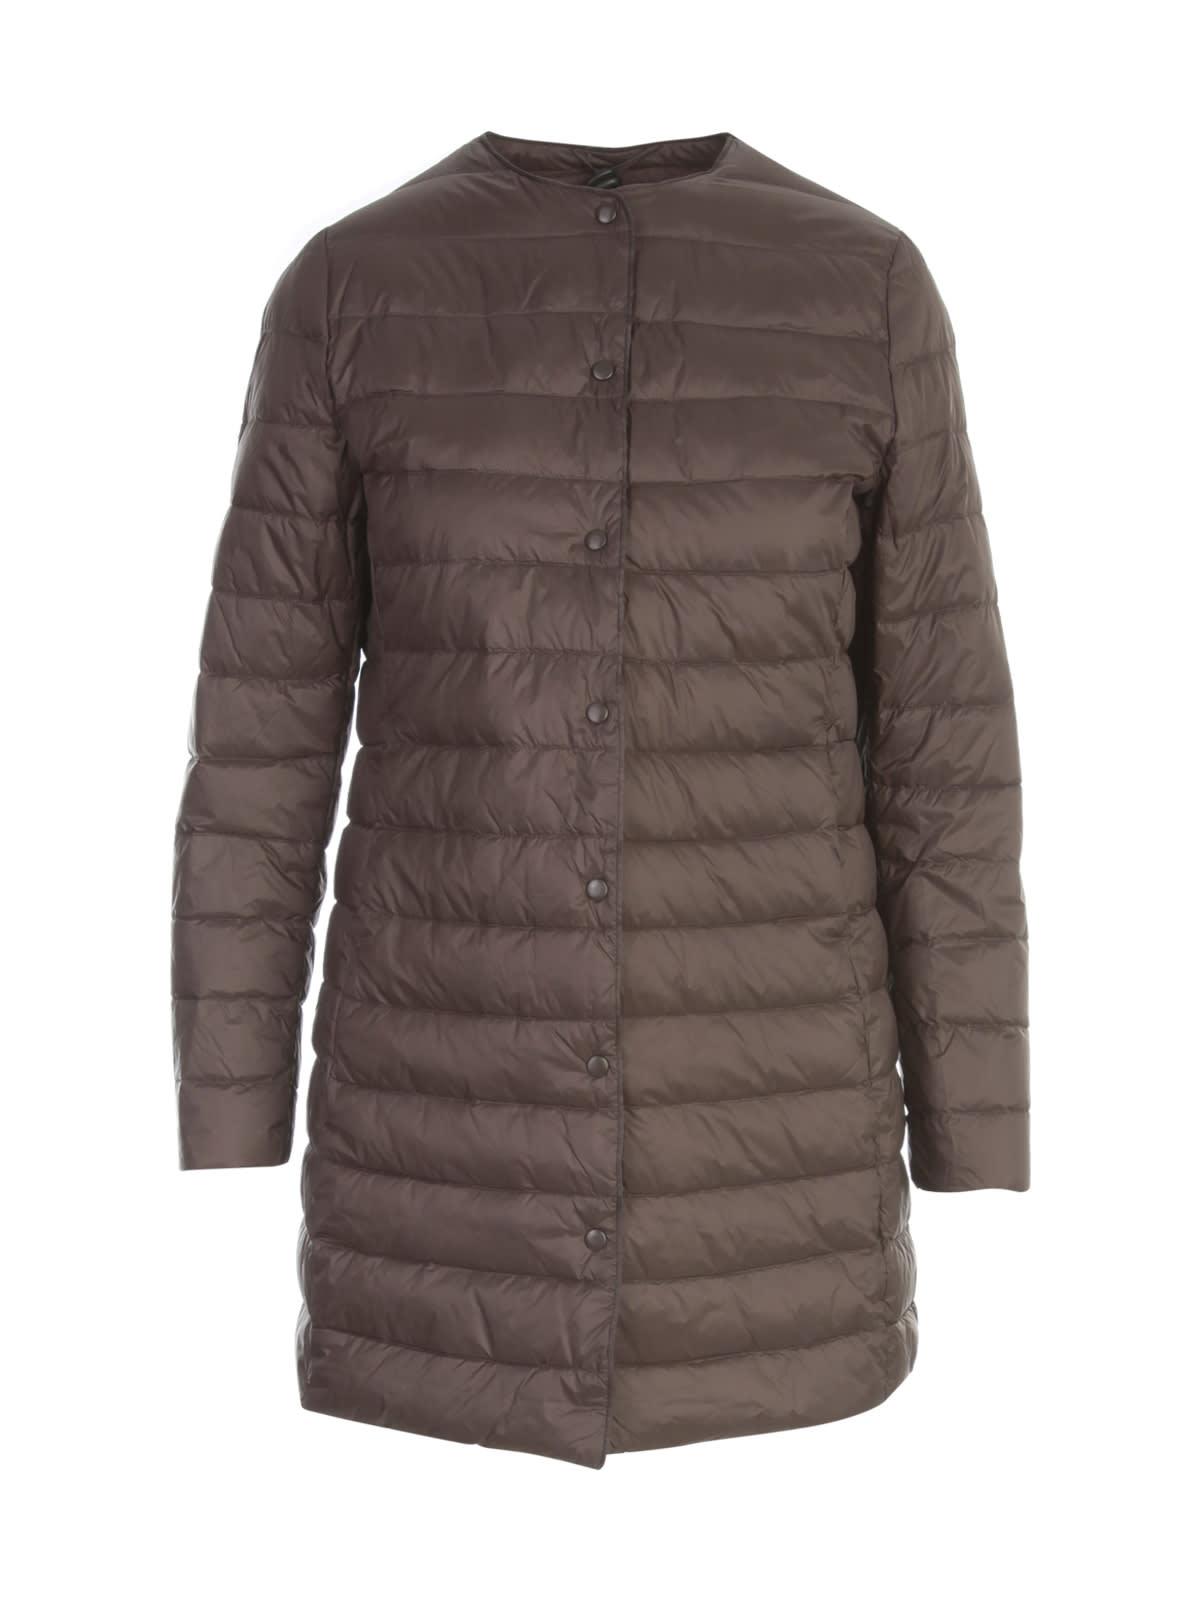 Rudy Padded Jacket